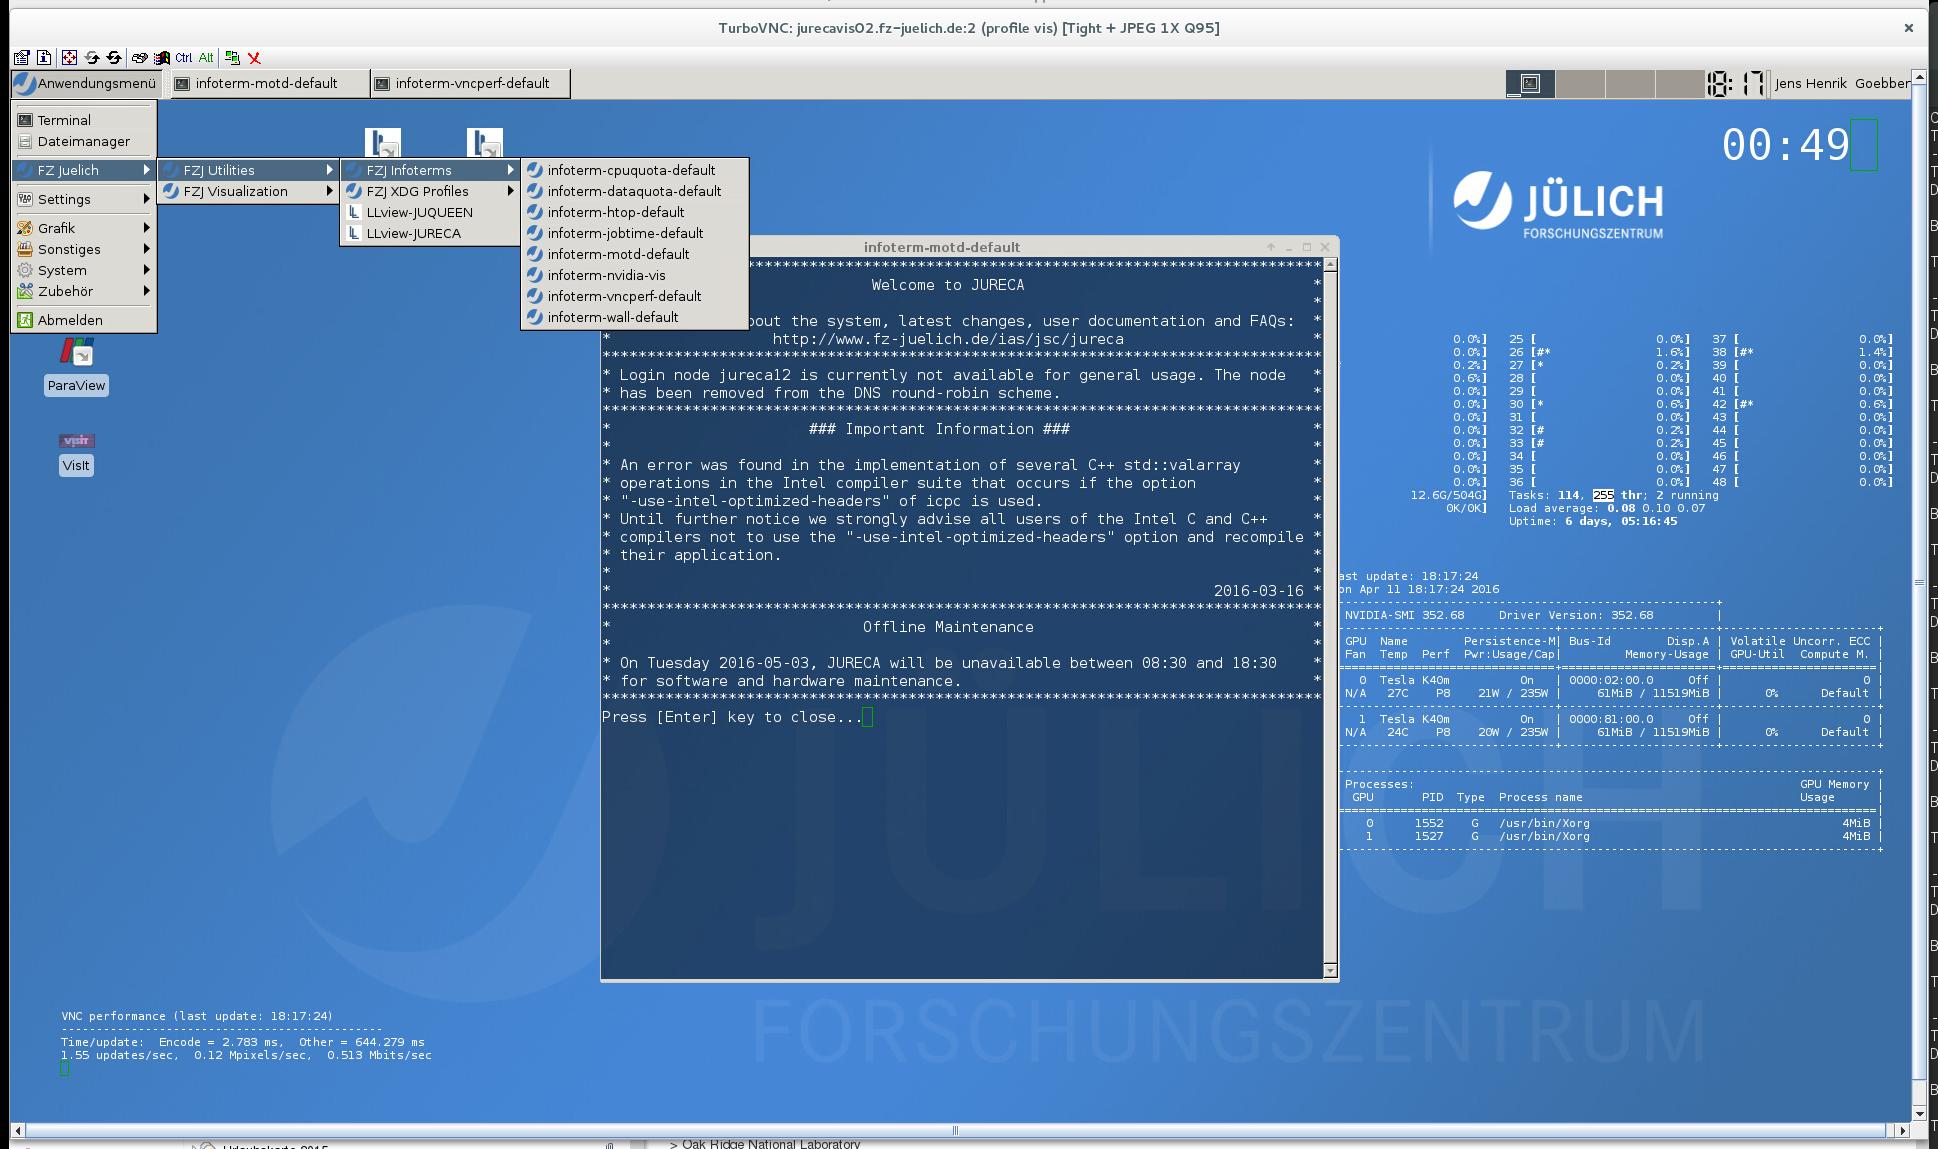 screenshot_xdg_profile_vis.png